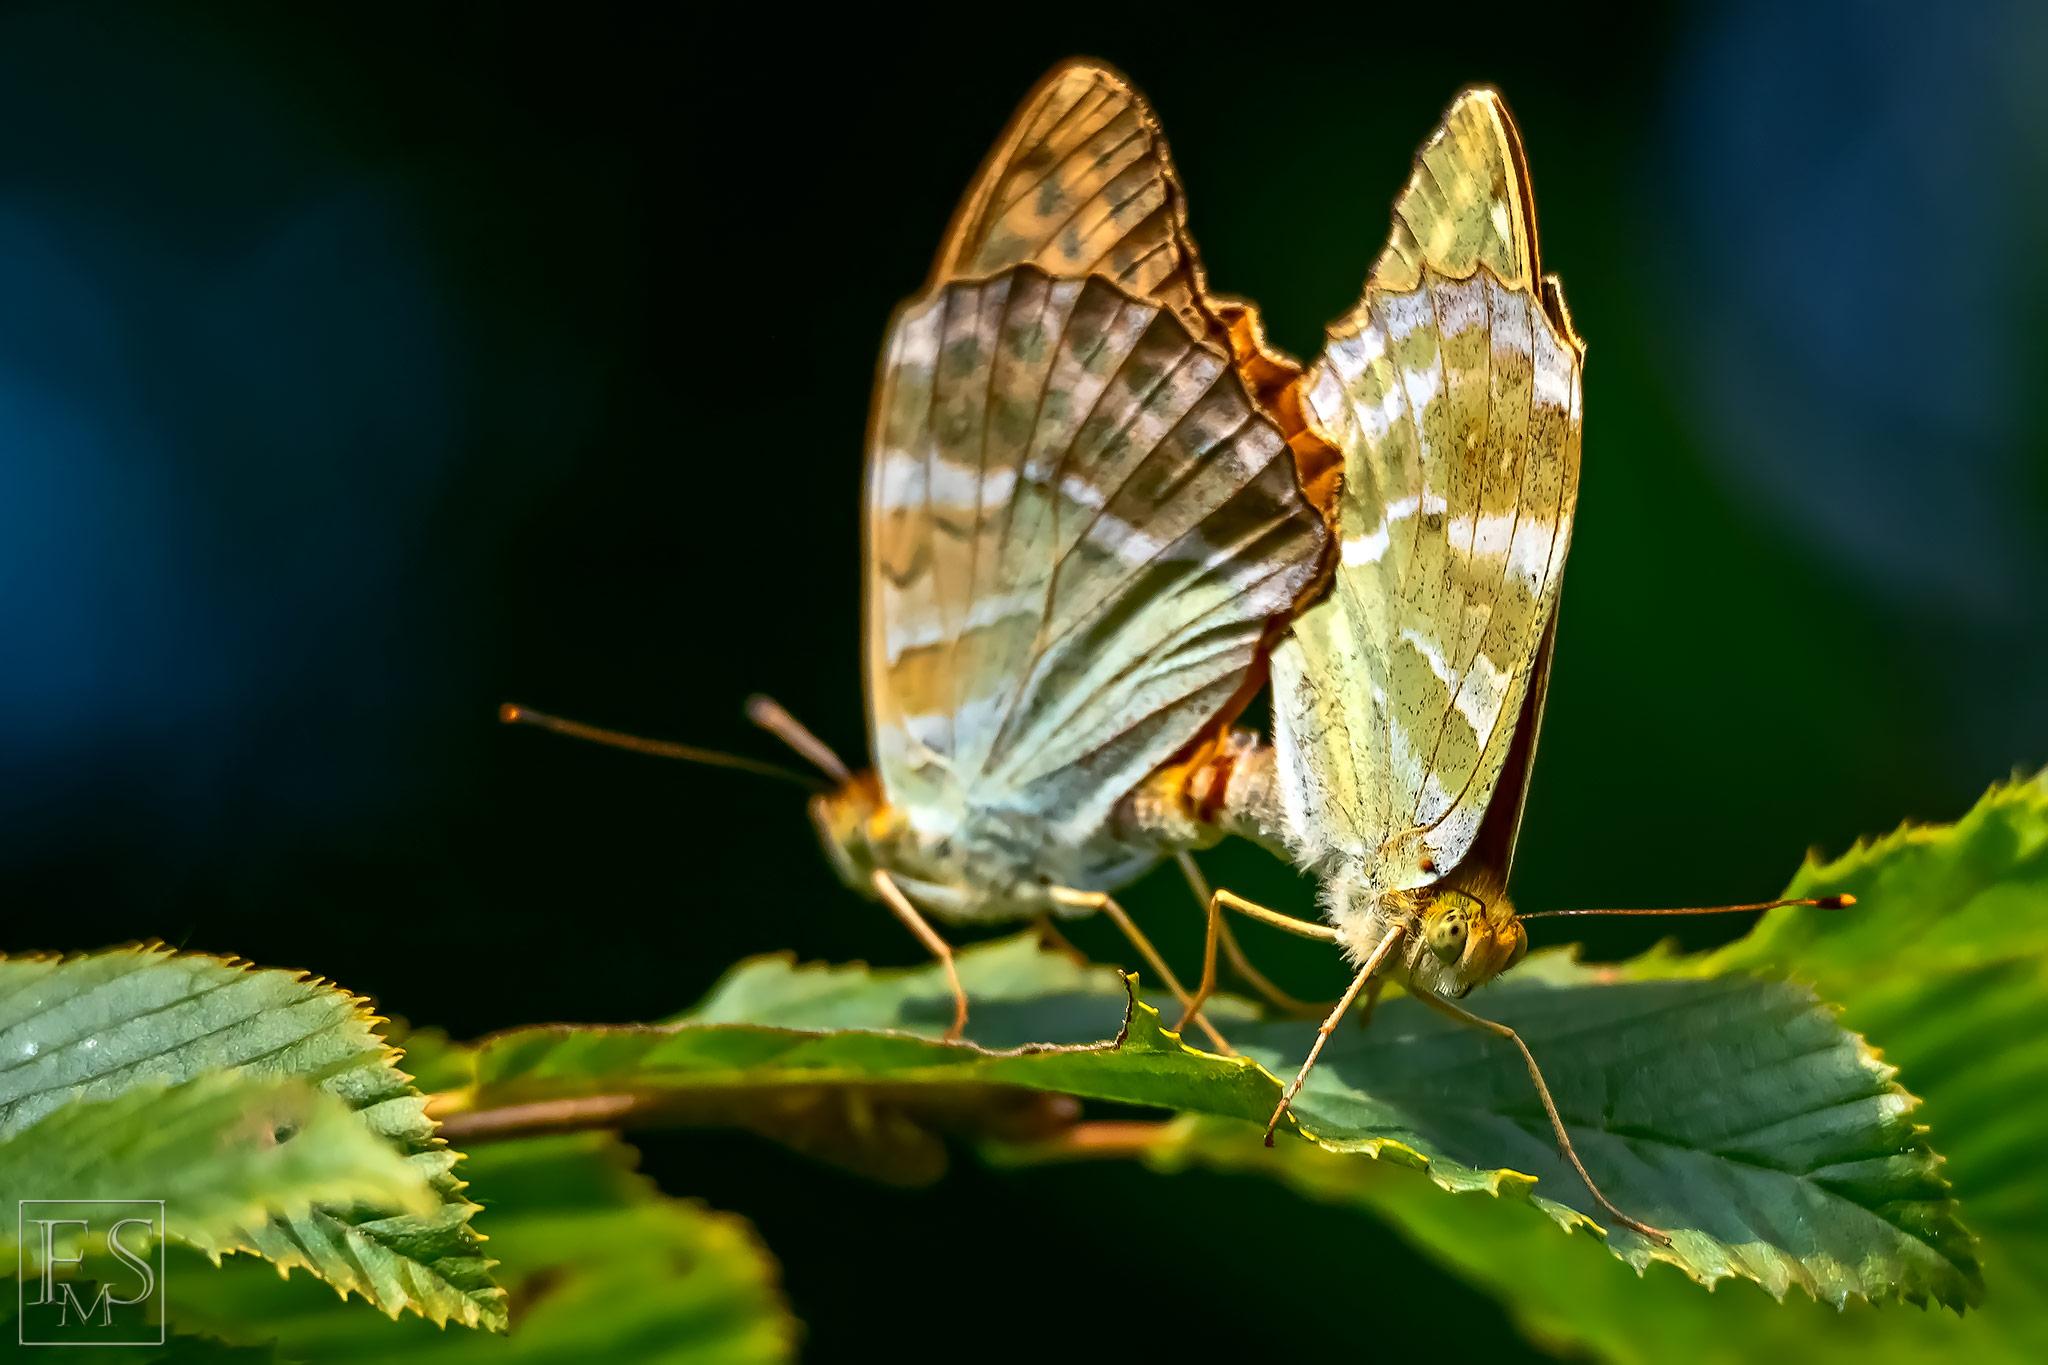 The Coupling Butterflies